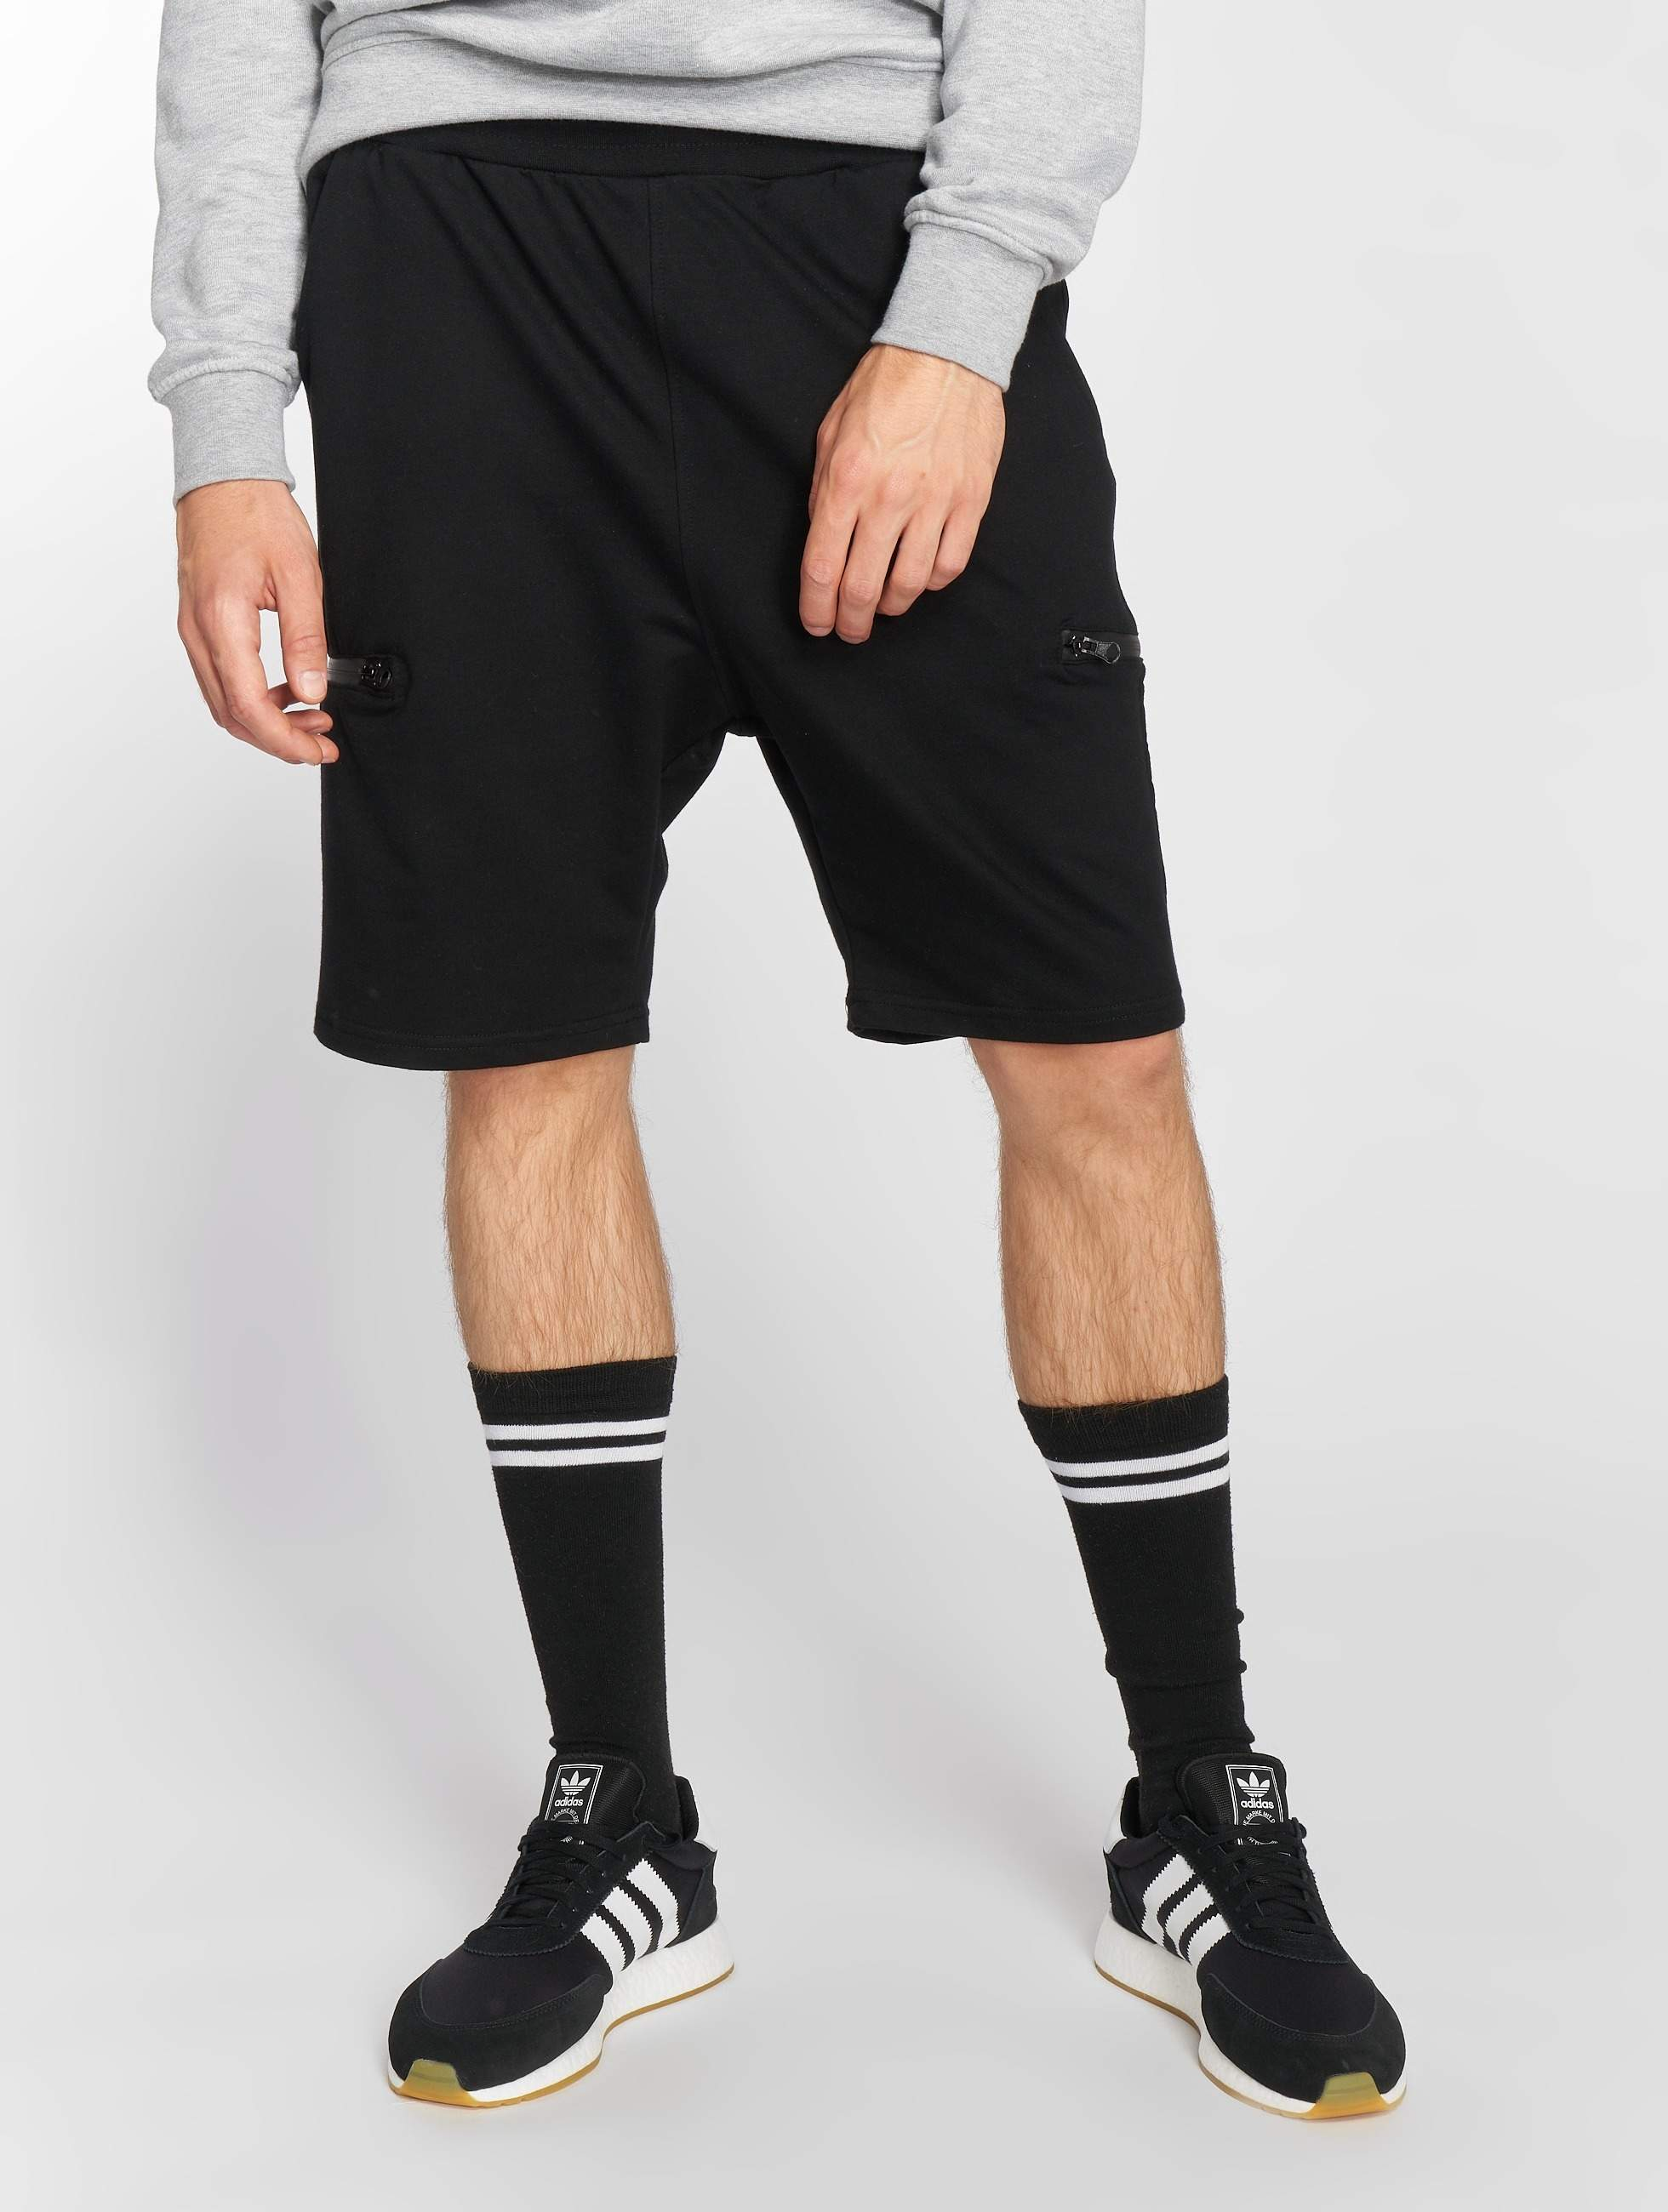 Bangastic / Short Zip in black M